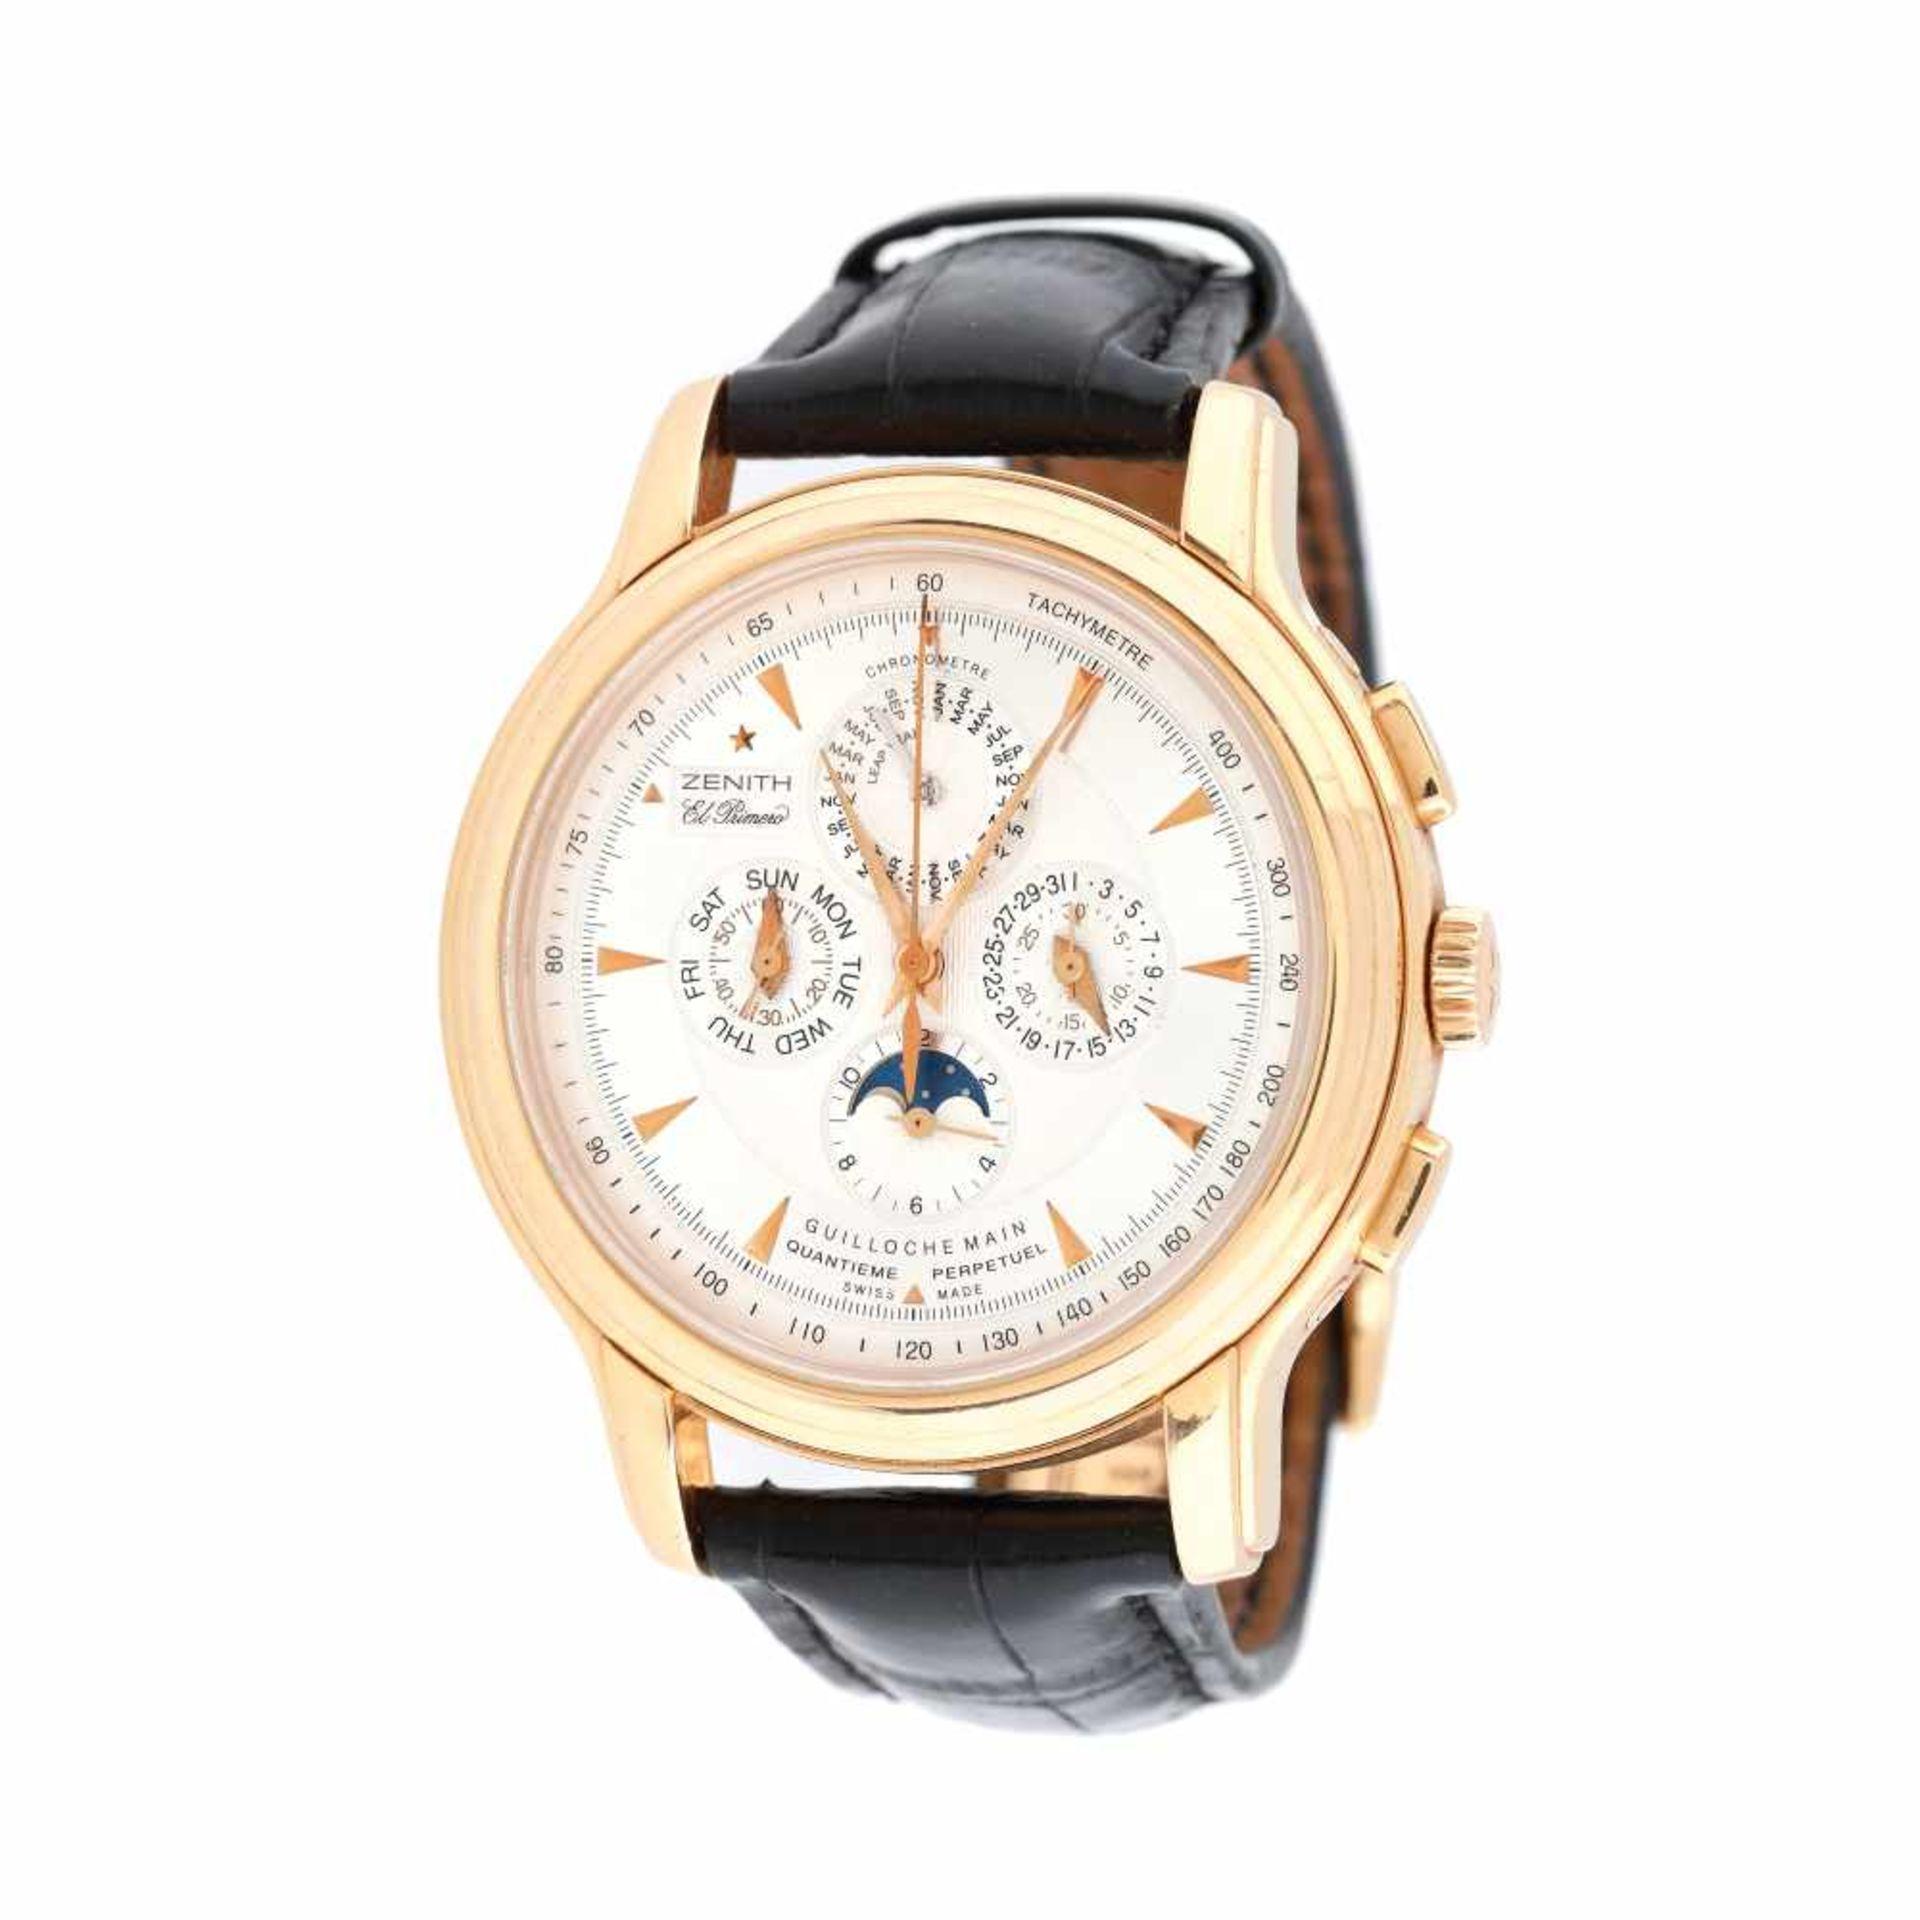 Zenith Chronomaster Millésime El Primero wristwatch, rose gold, men